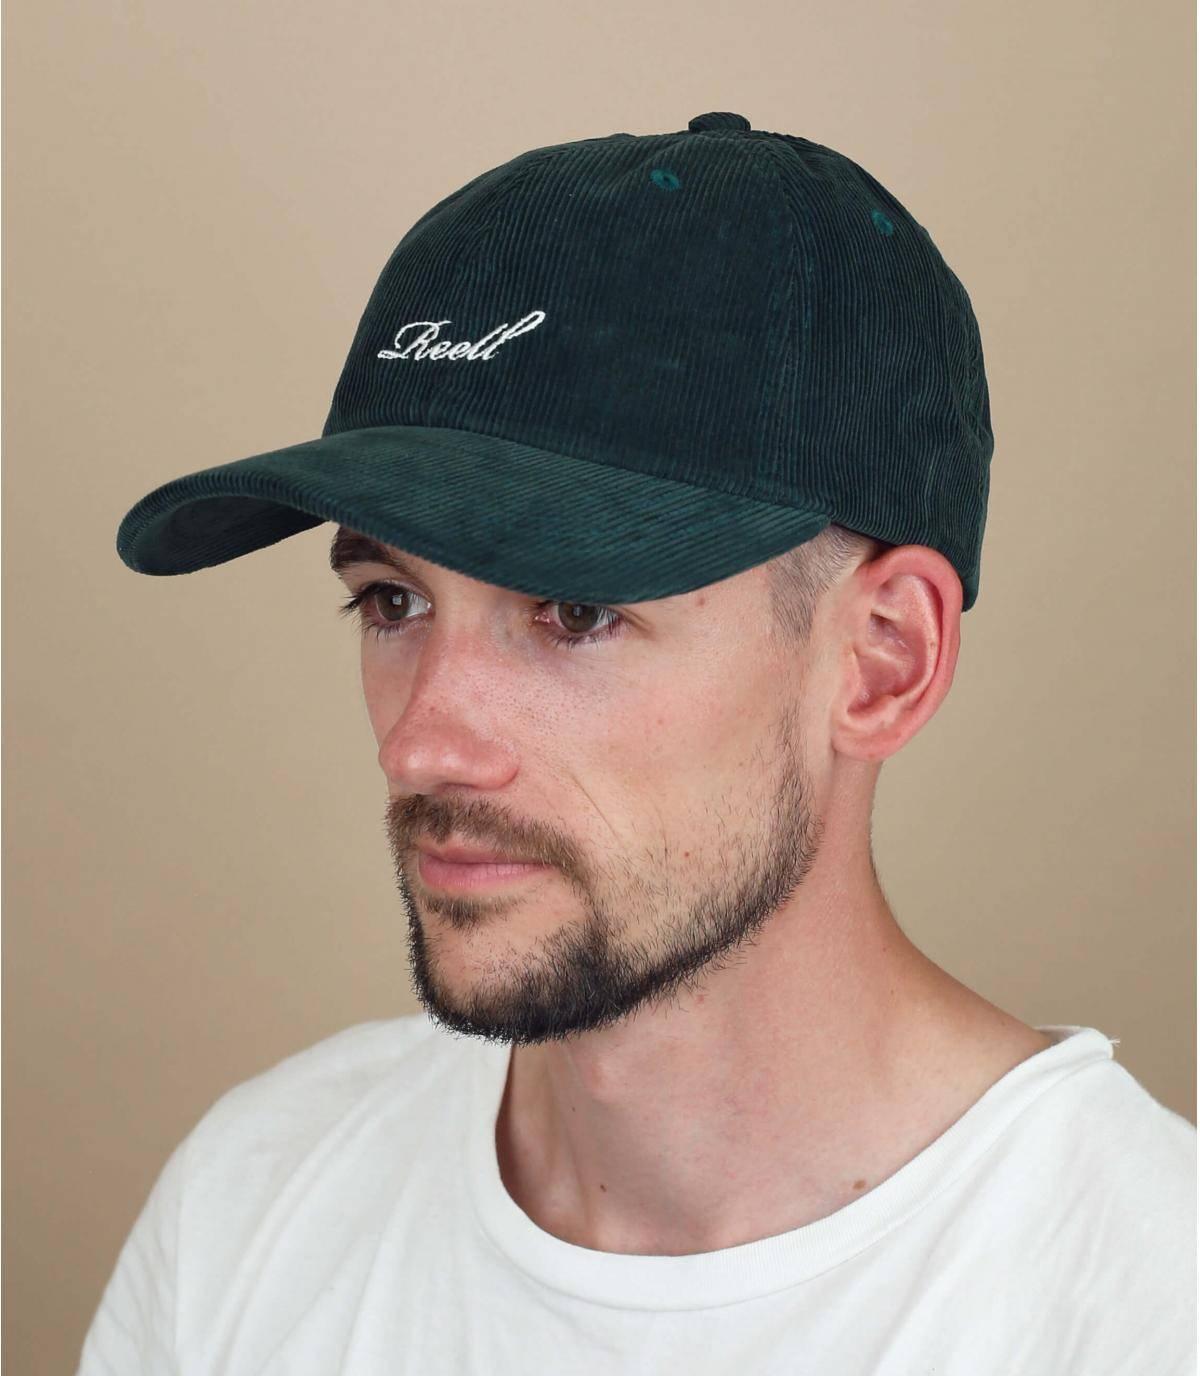 Gorra pana verde Reell